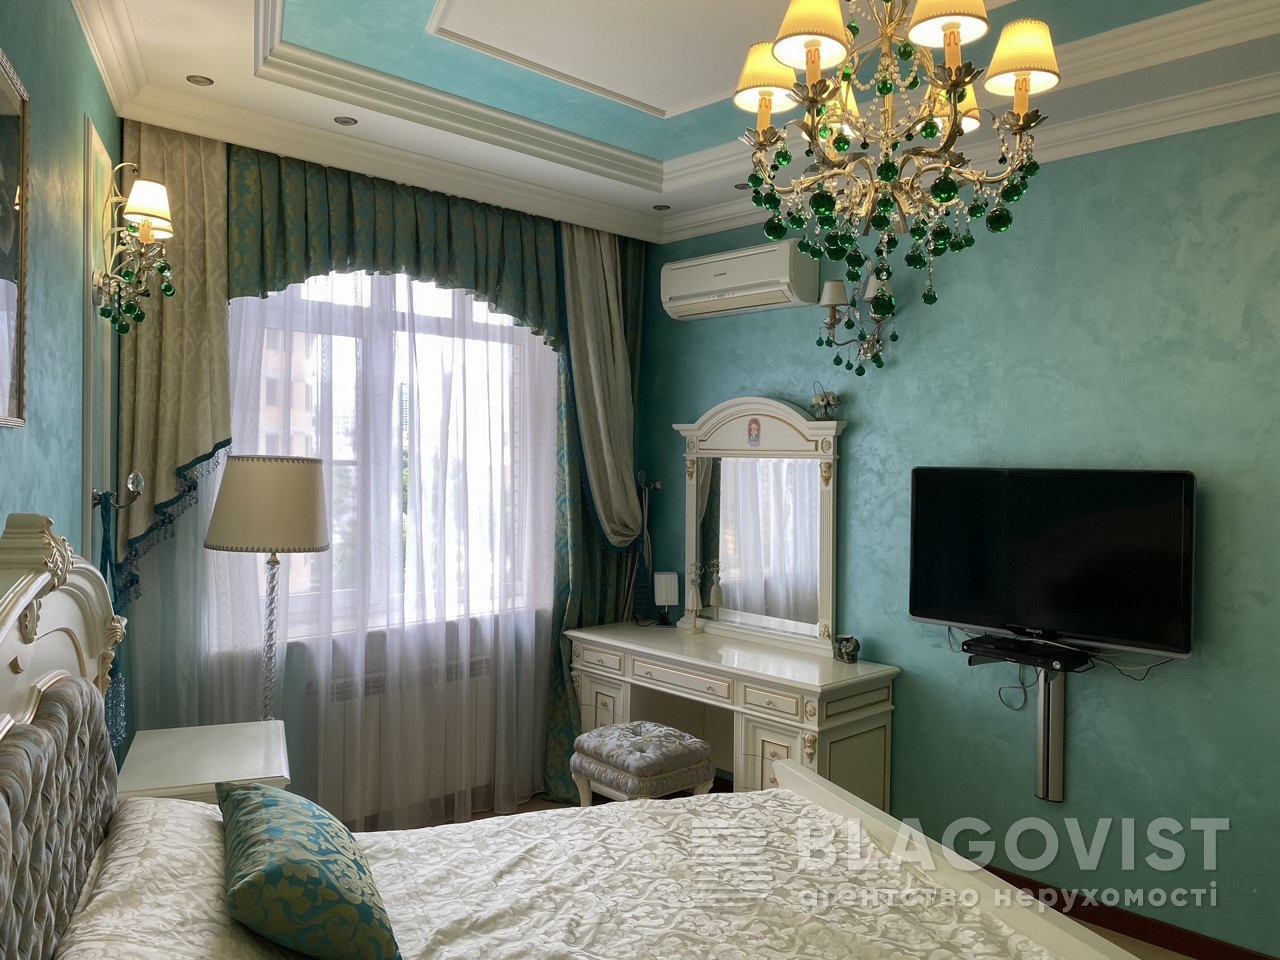 Квартира R-39283, Старонаводницкая, 6б, Киев - Фото 17